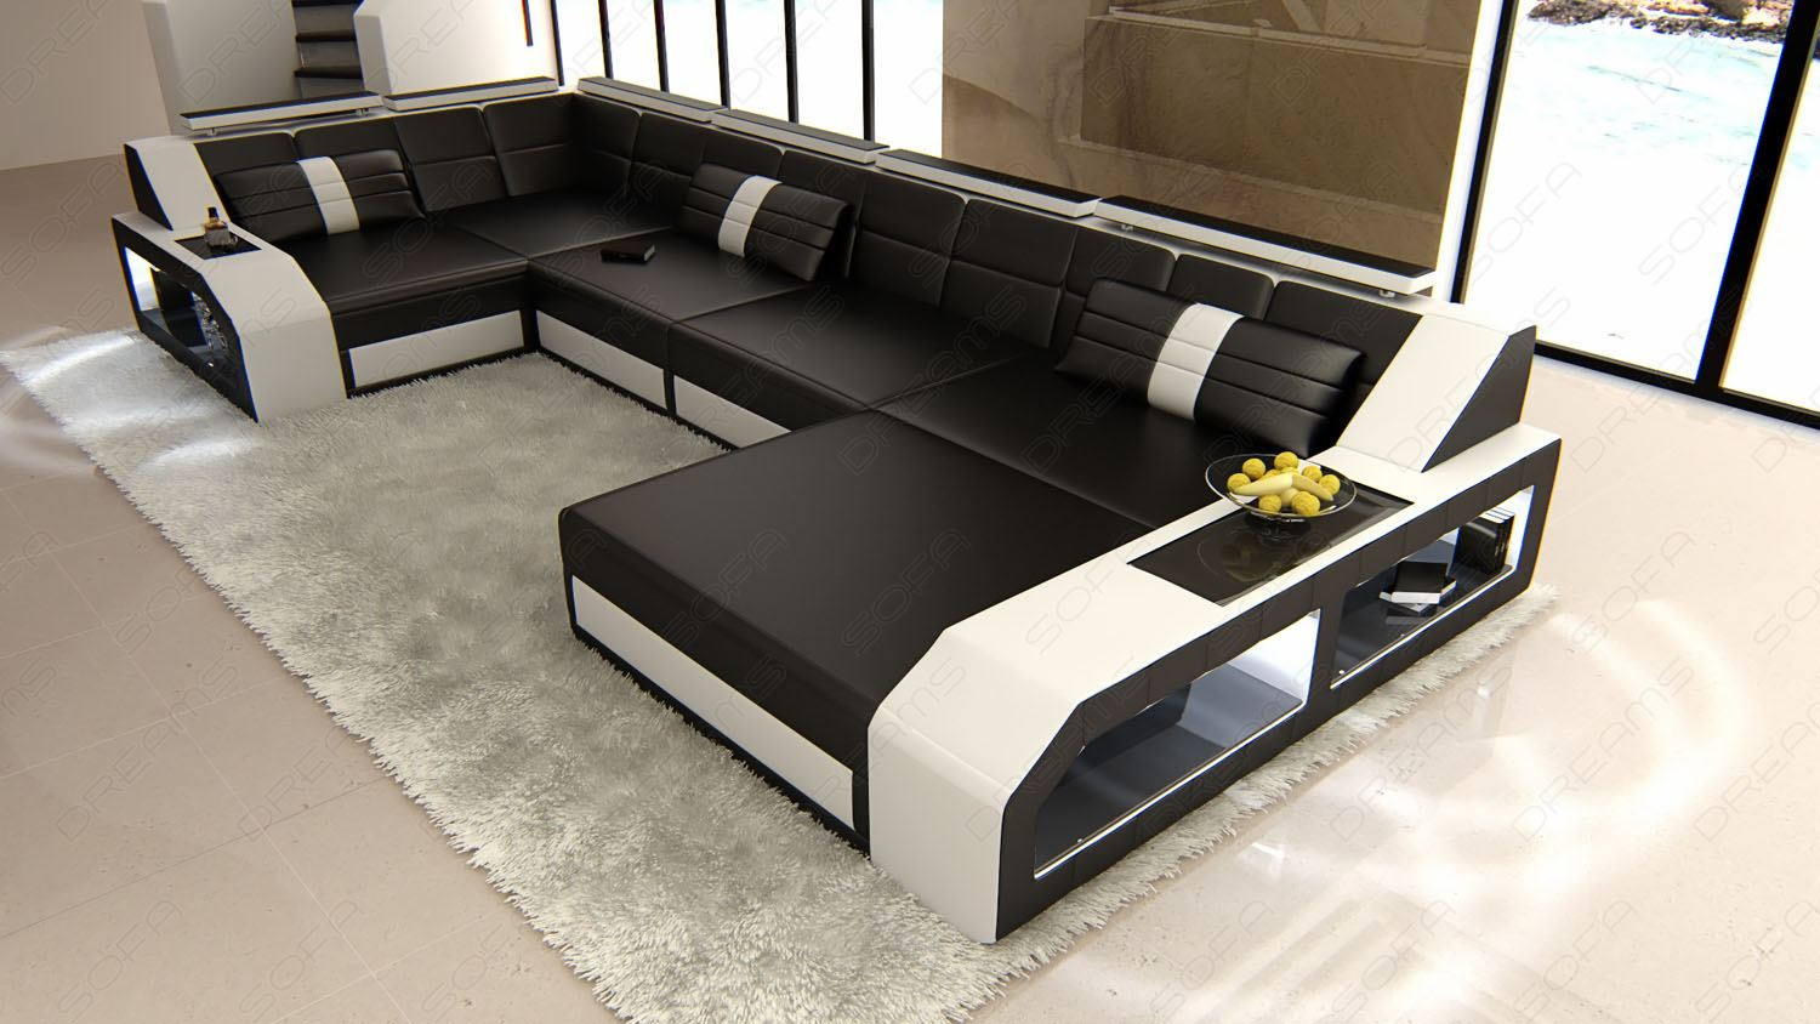 design sectional sofa arezzo led black white ebay. Black Bedroom Furniture Sets. Home Design Ideas